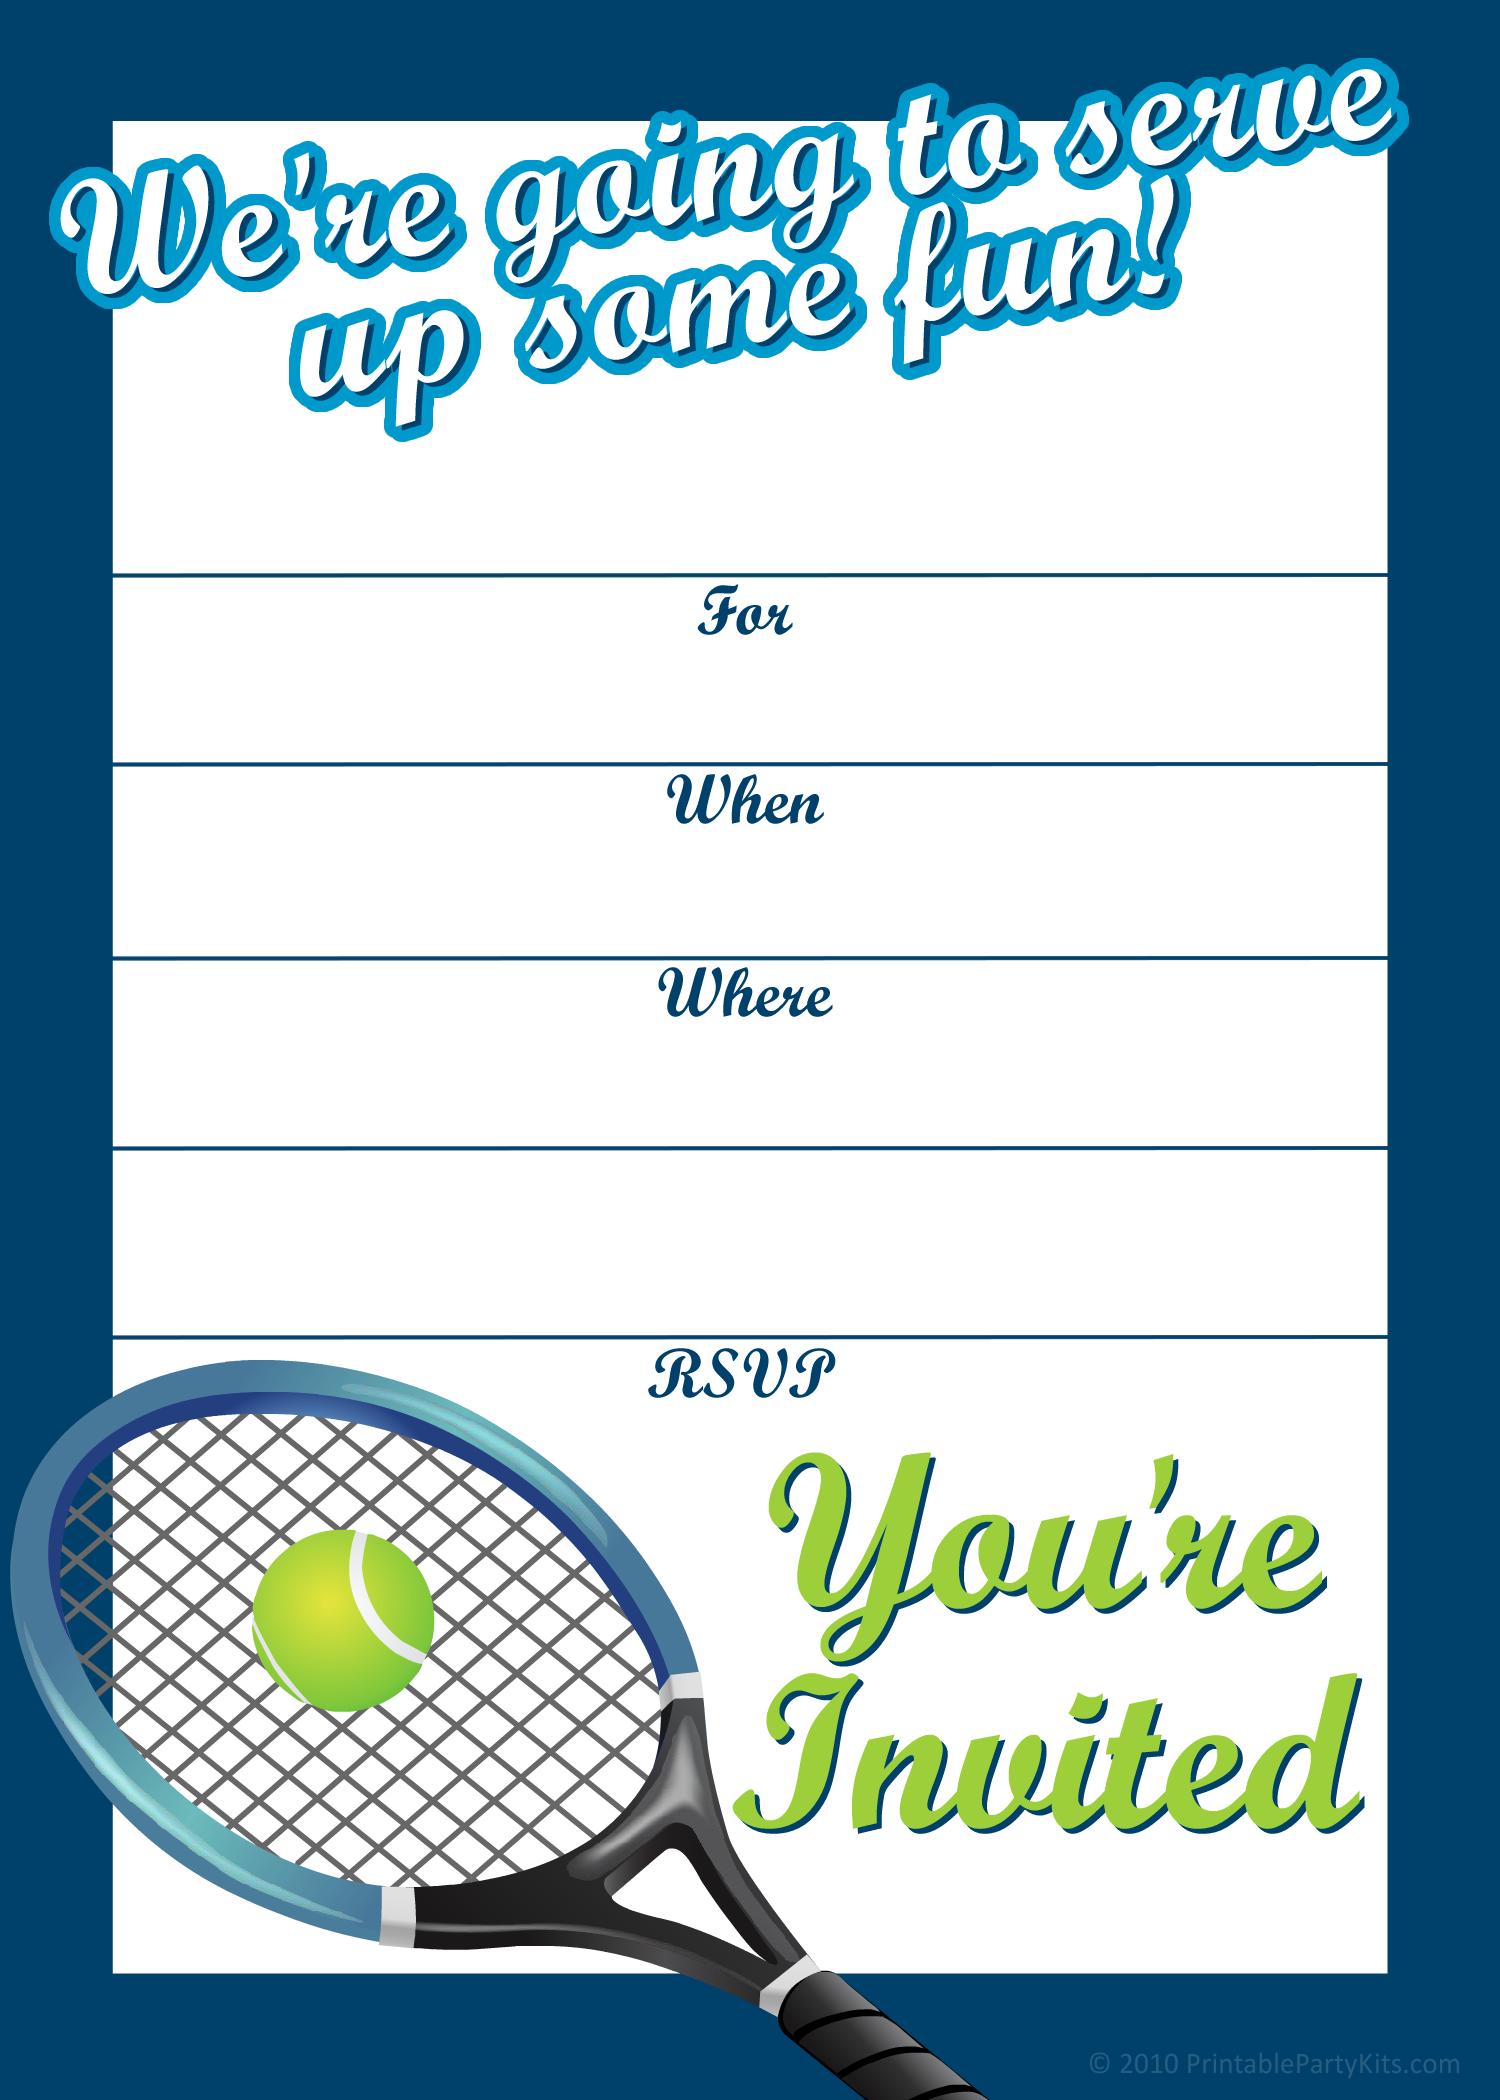 Free Printable Sports Birthday Party Invitations Templates ...